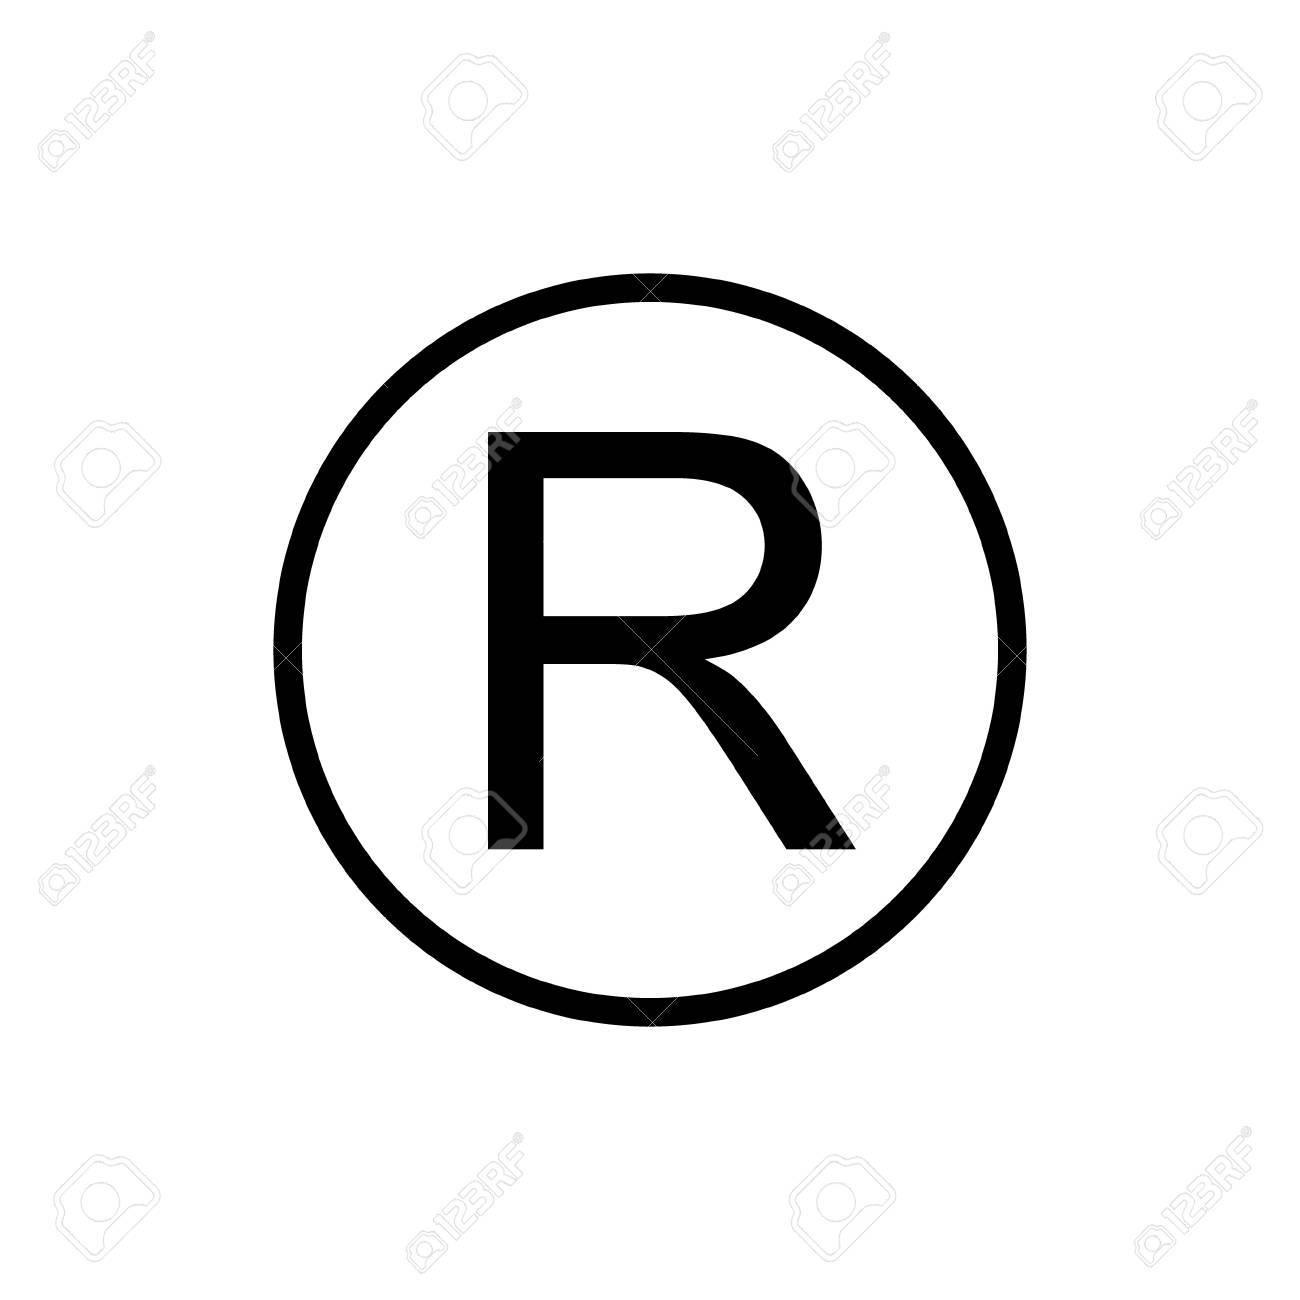 registered trademark sign dark gray icon on transparent background stock vector 84565467